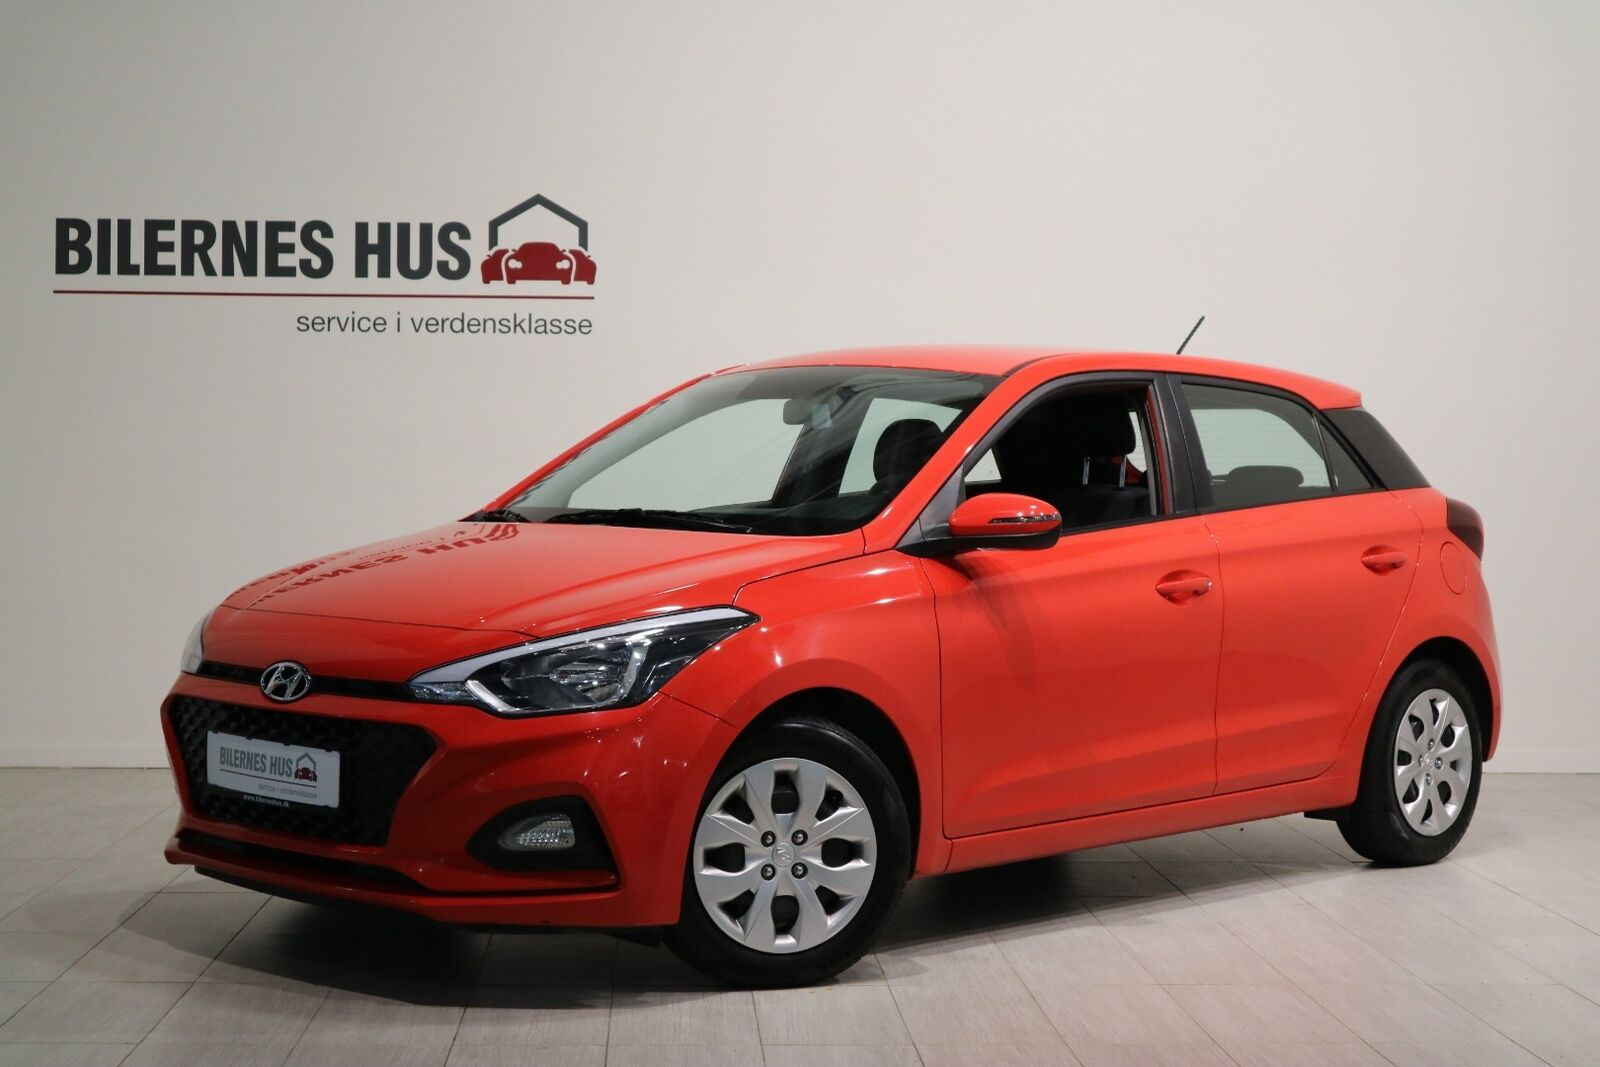 Hyundai i20 Billede 4